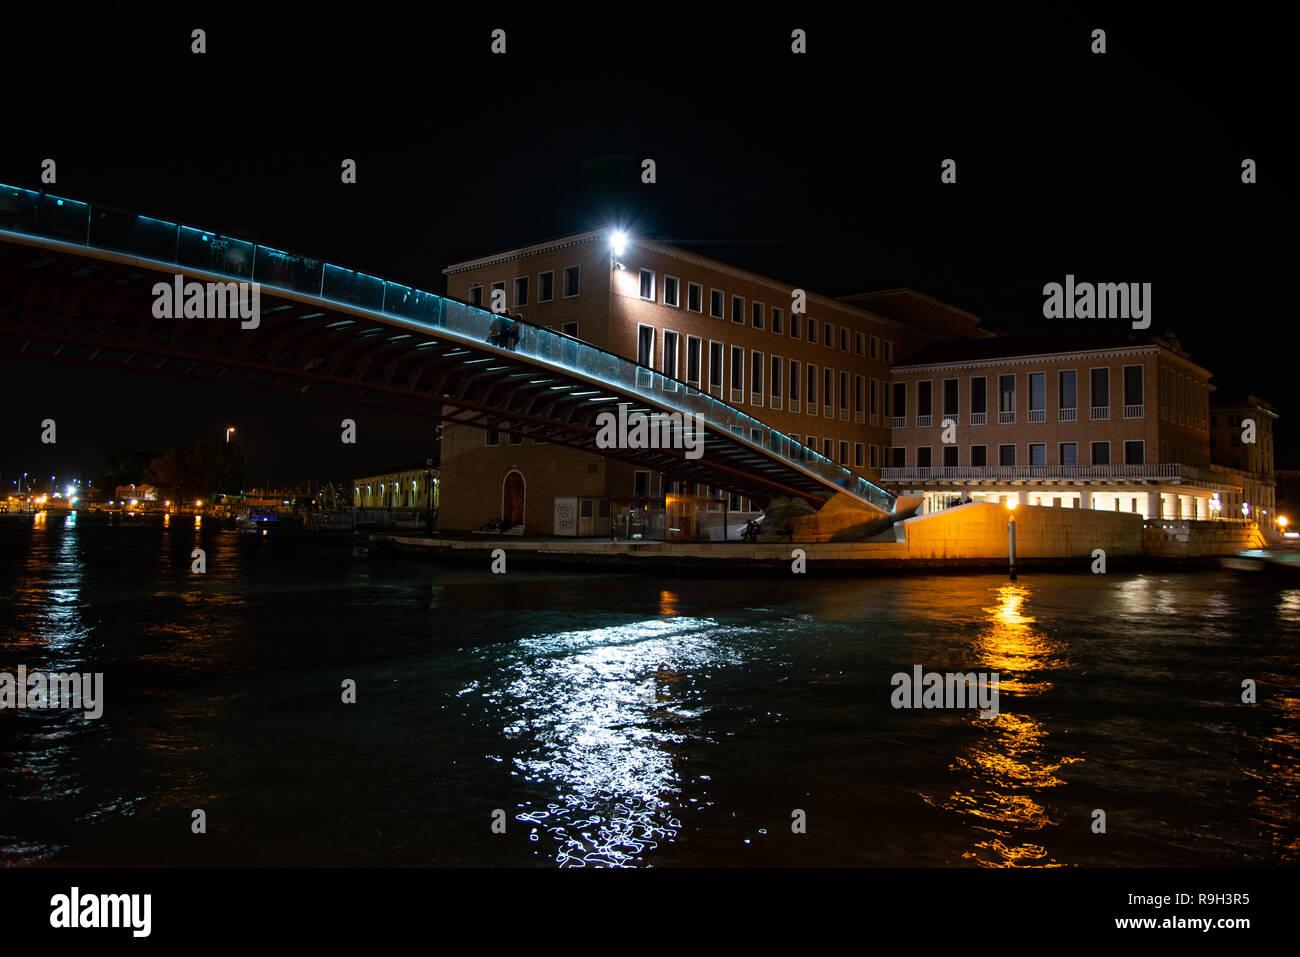 Night view of the controversial Constitution Bridge in Venice, Italy. Designed by the starchitect Santiago Calatrava, the bridge opend in 2008 - Stock Image